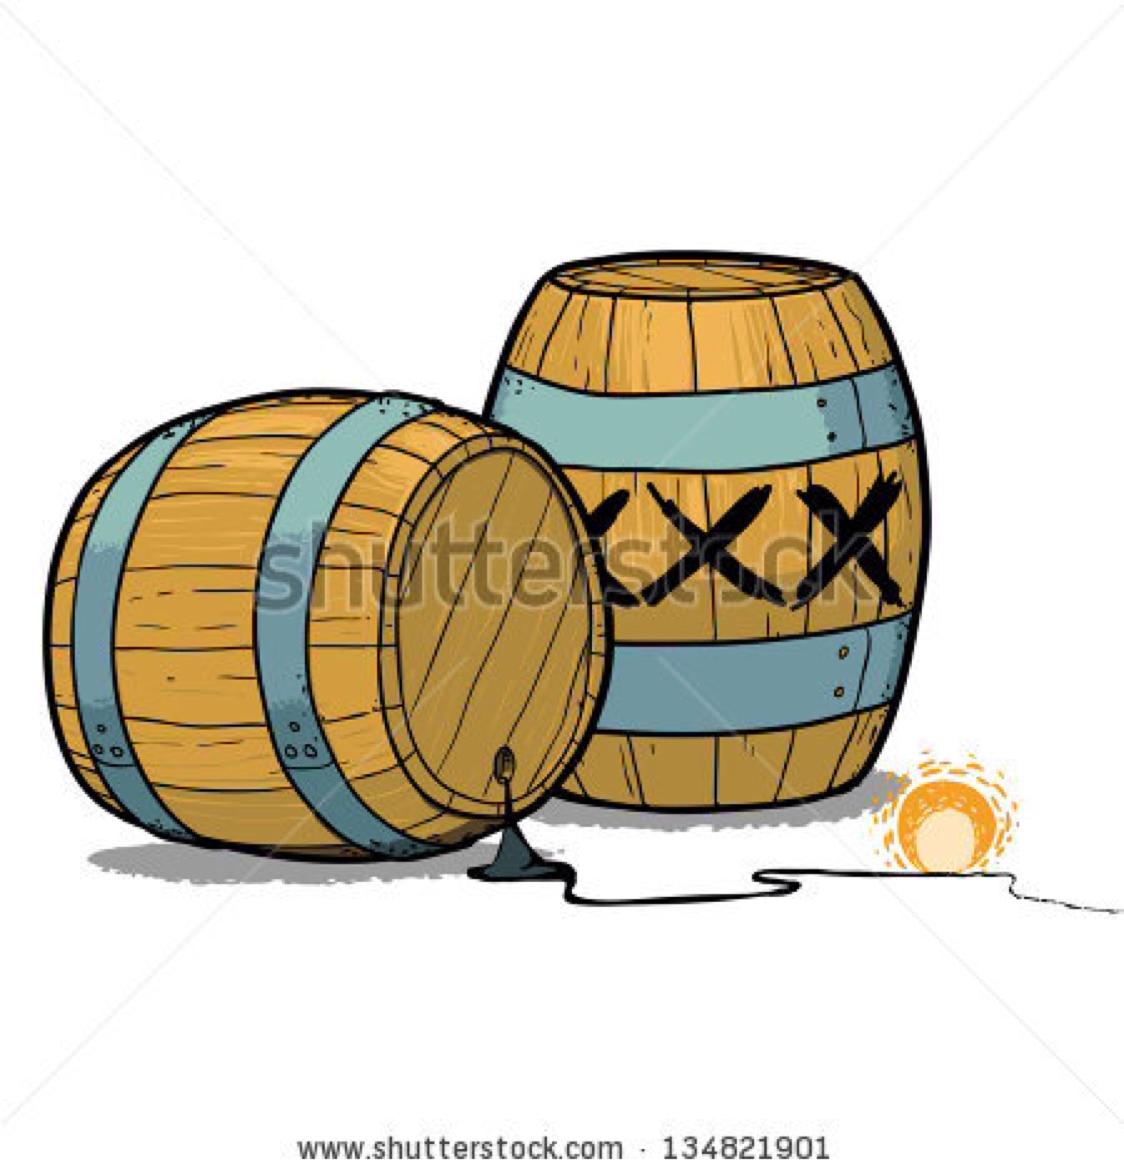 The th of nobember. Barrel clipart gunpowder